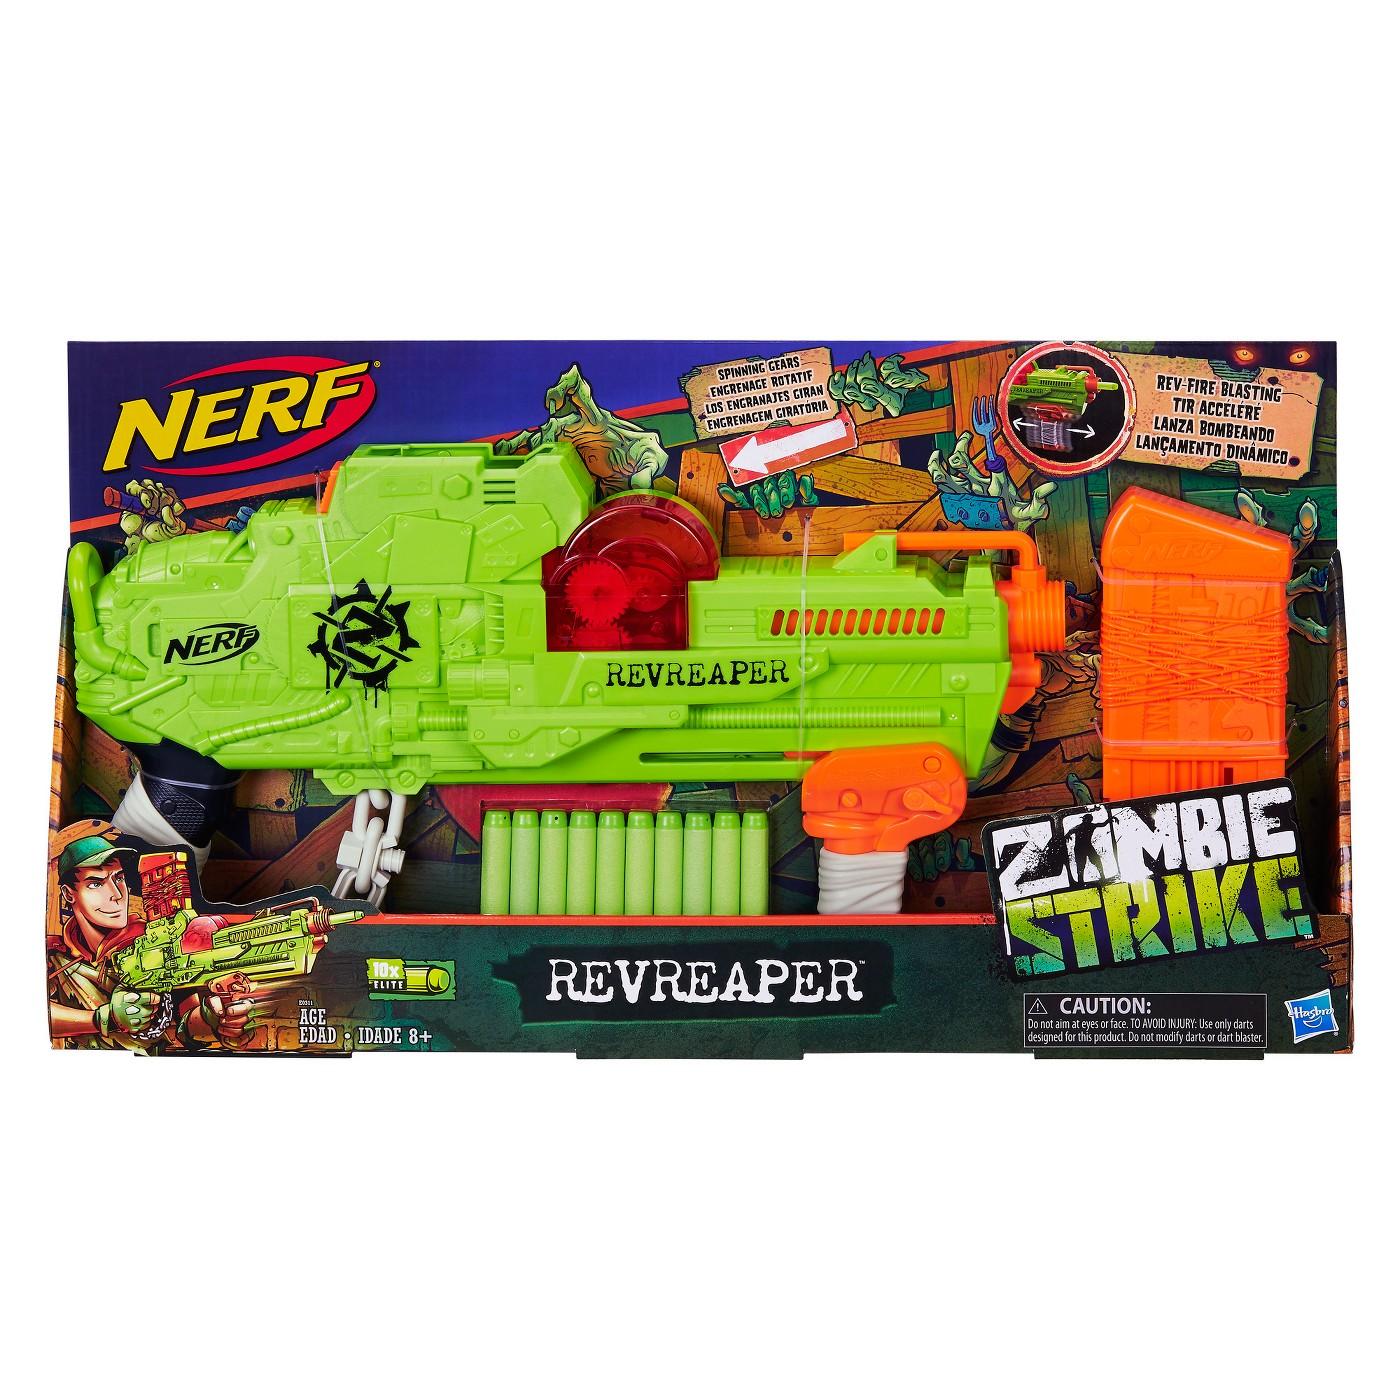 NERF Zombie Strike RevReaper Blaster - image 2 of 5